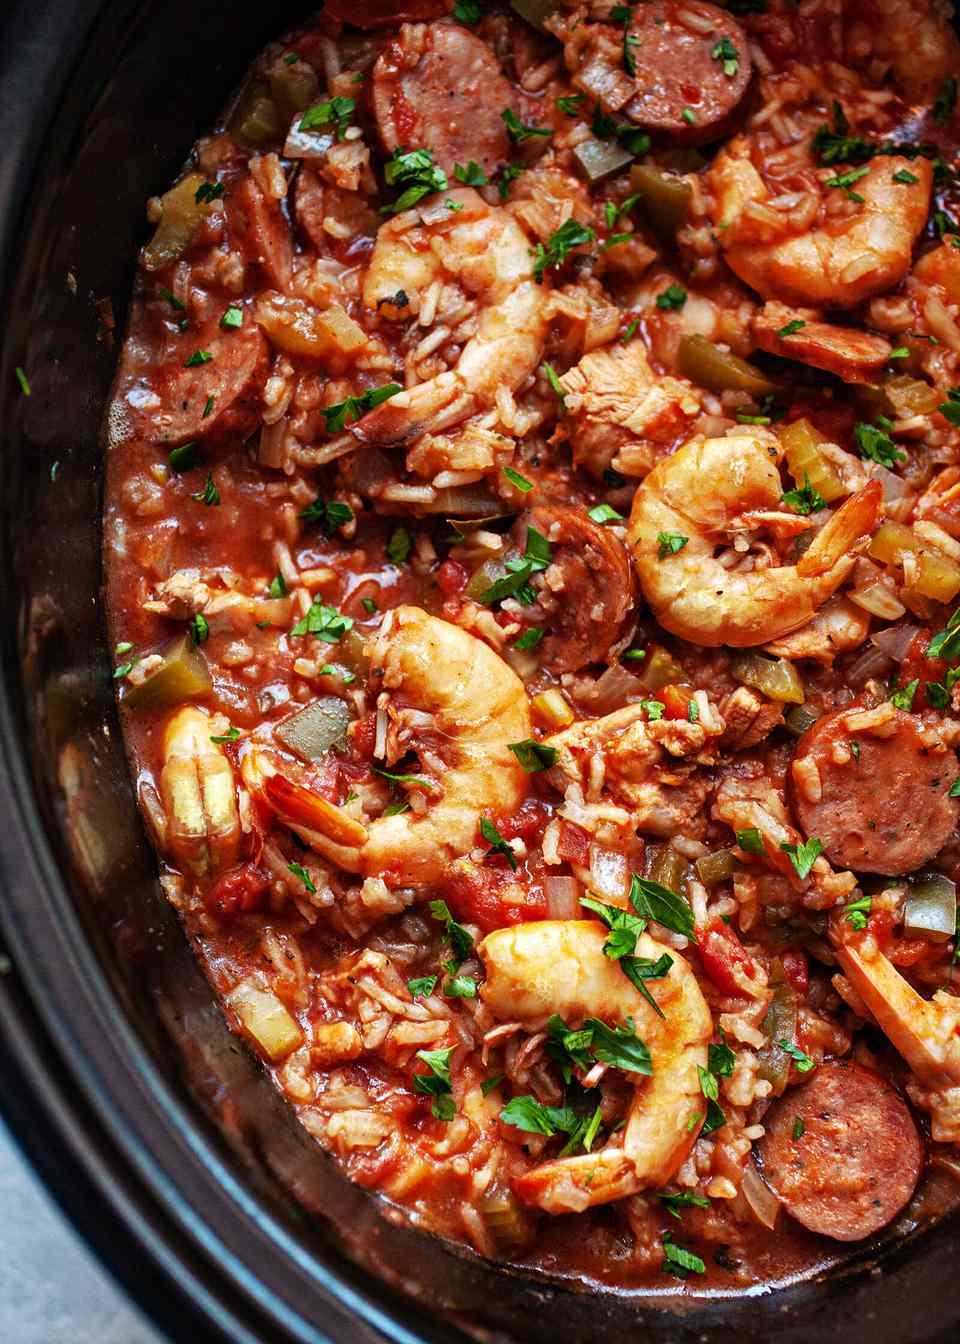 How to Make Jambalaya in the Crockpot